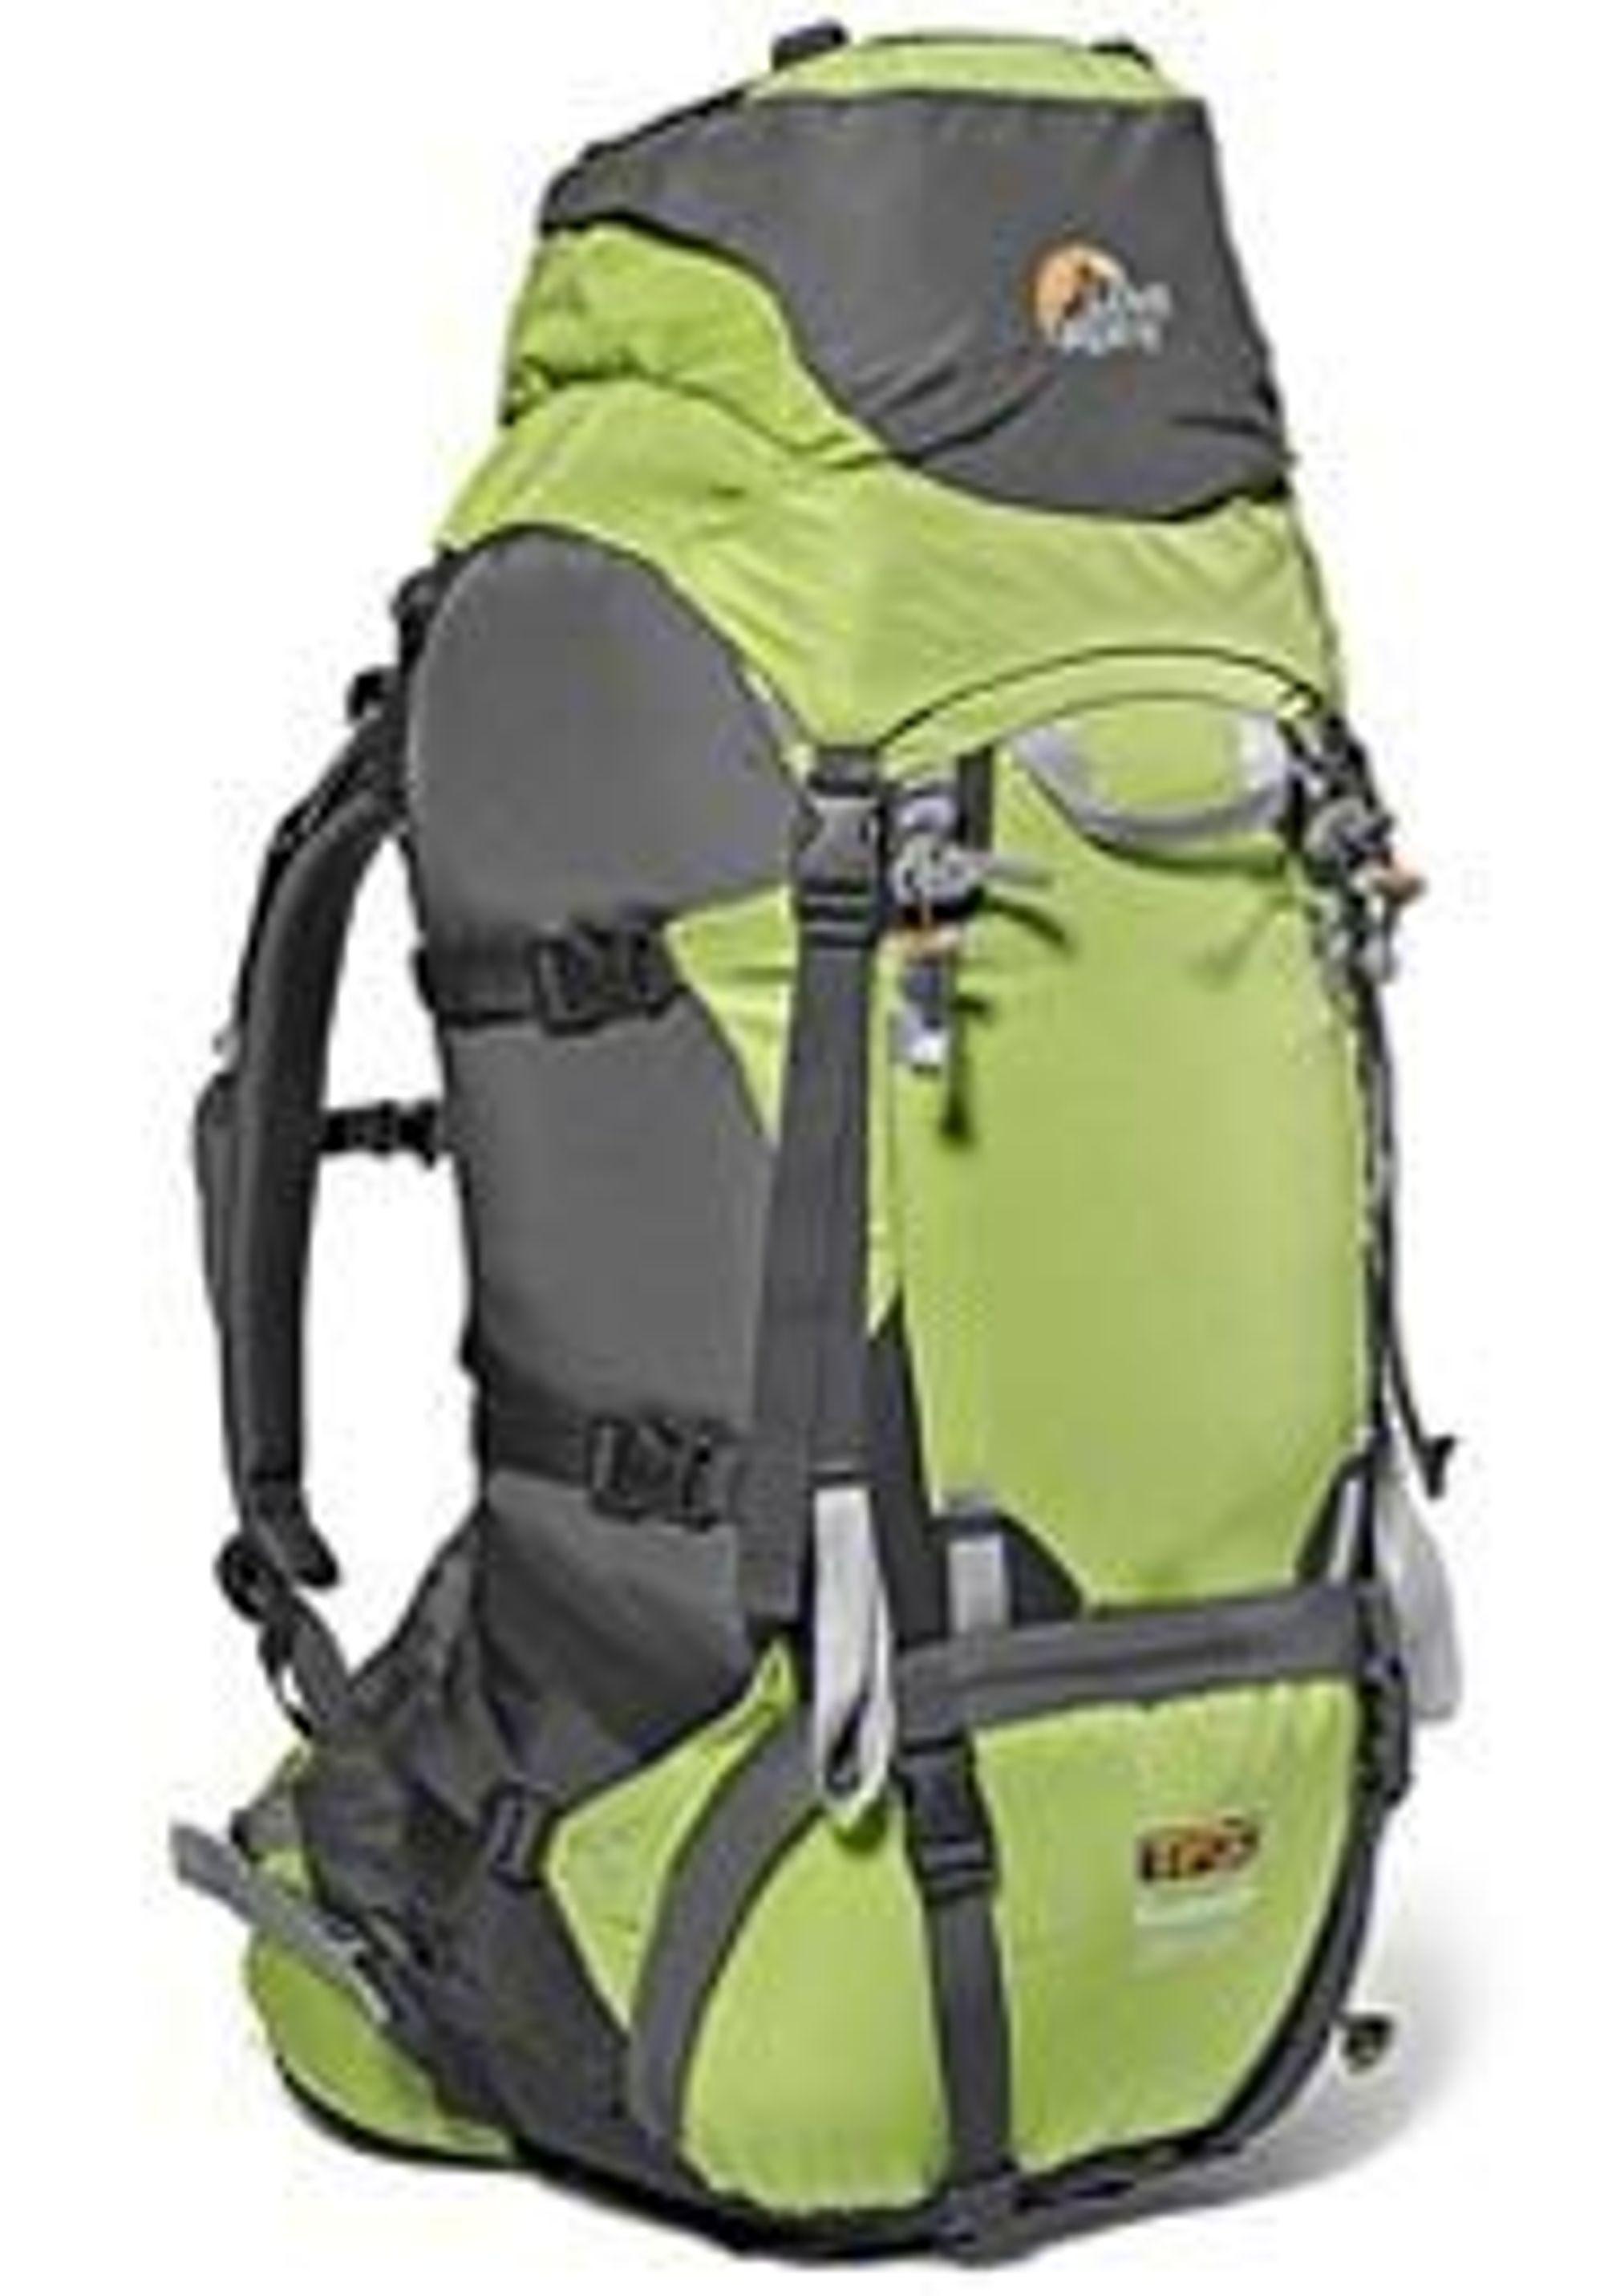 Lowe Alpine TFX9. Ryggsekk. Sportsutstyr. Ny teknologi. Oppblåsbare luftlommer.